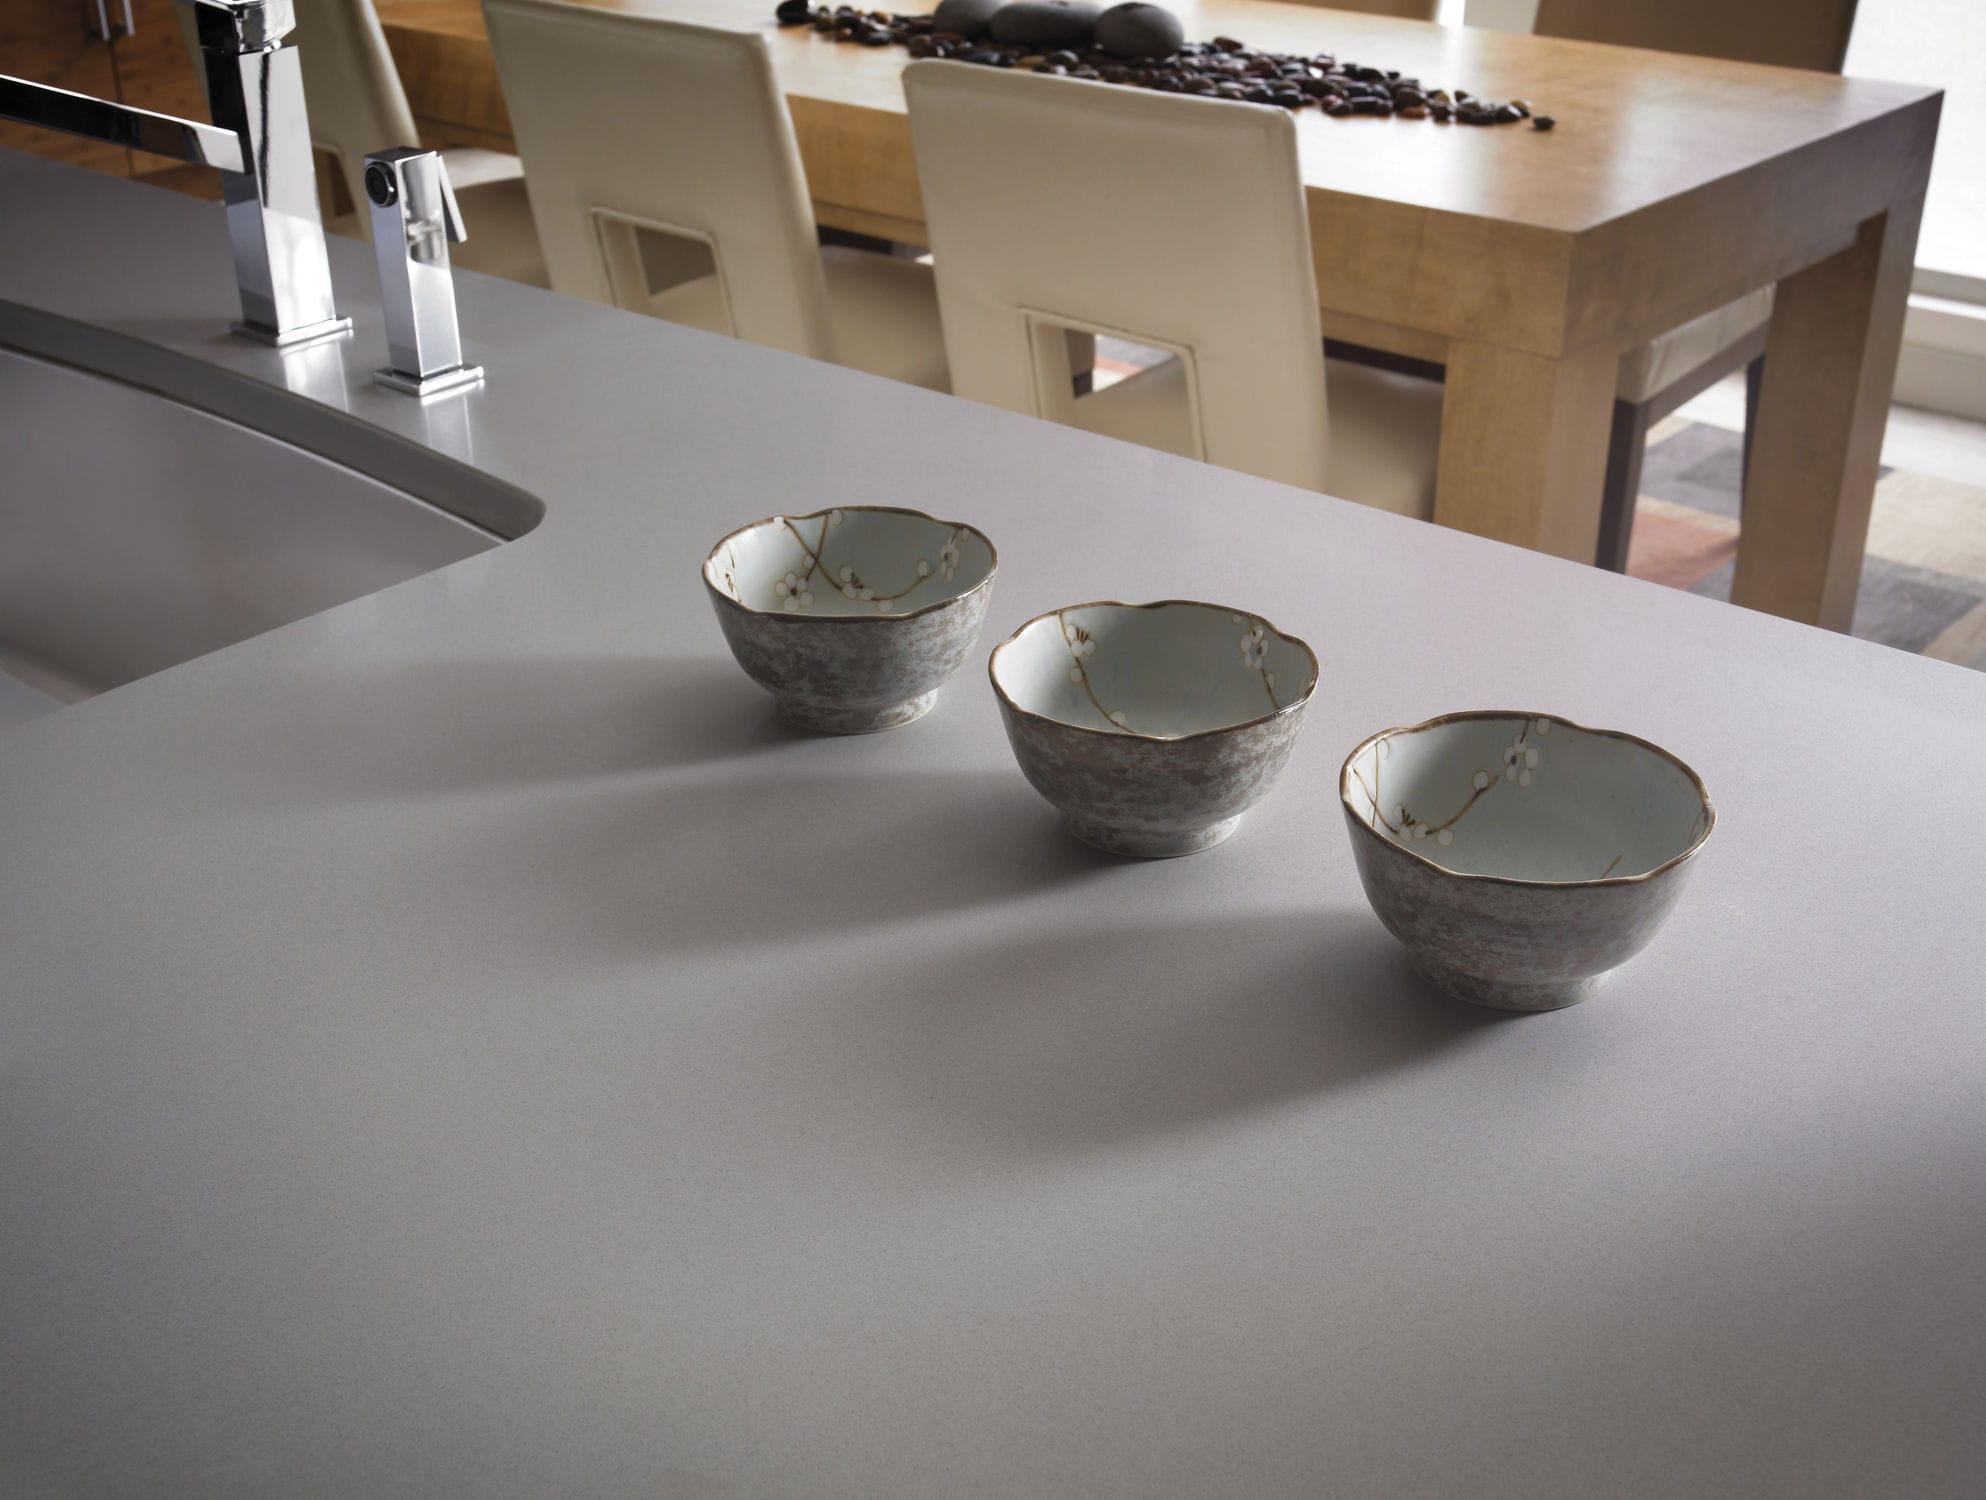 Silestone®-Arbeitsplatte / Küchen / grau - KENSHO - Cosentino